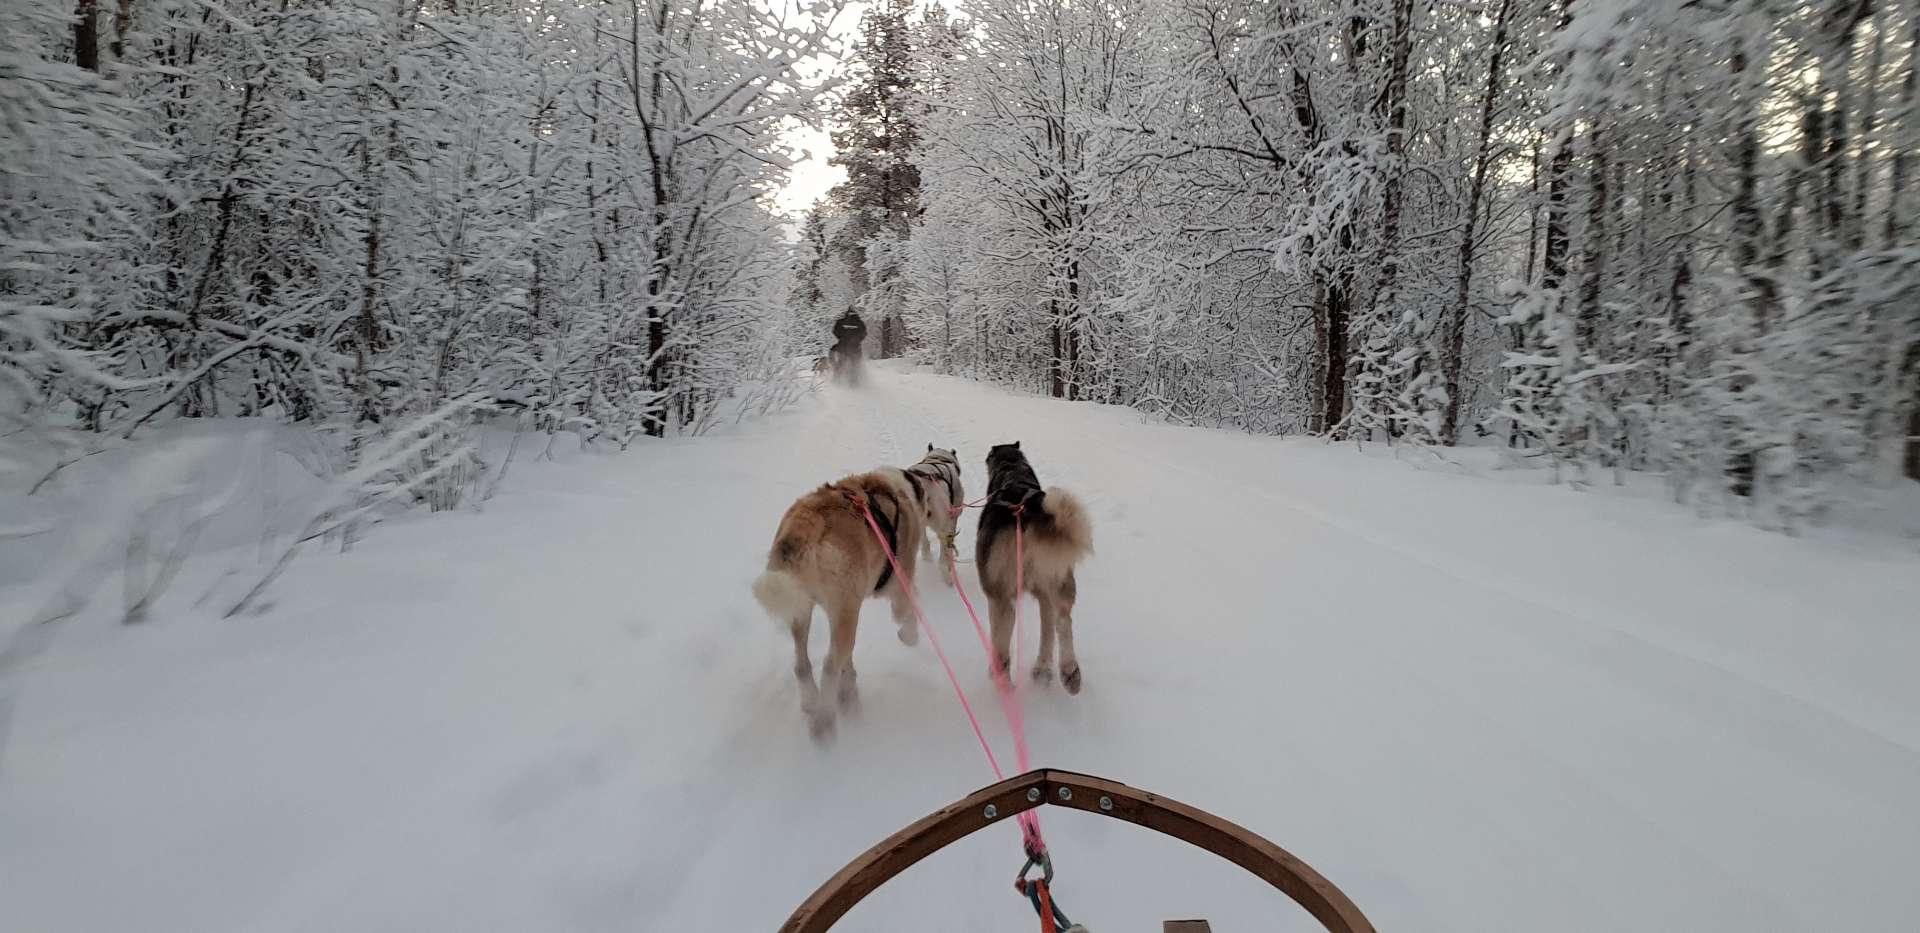 Tromso Dog Sledding hasselberg husky norway